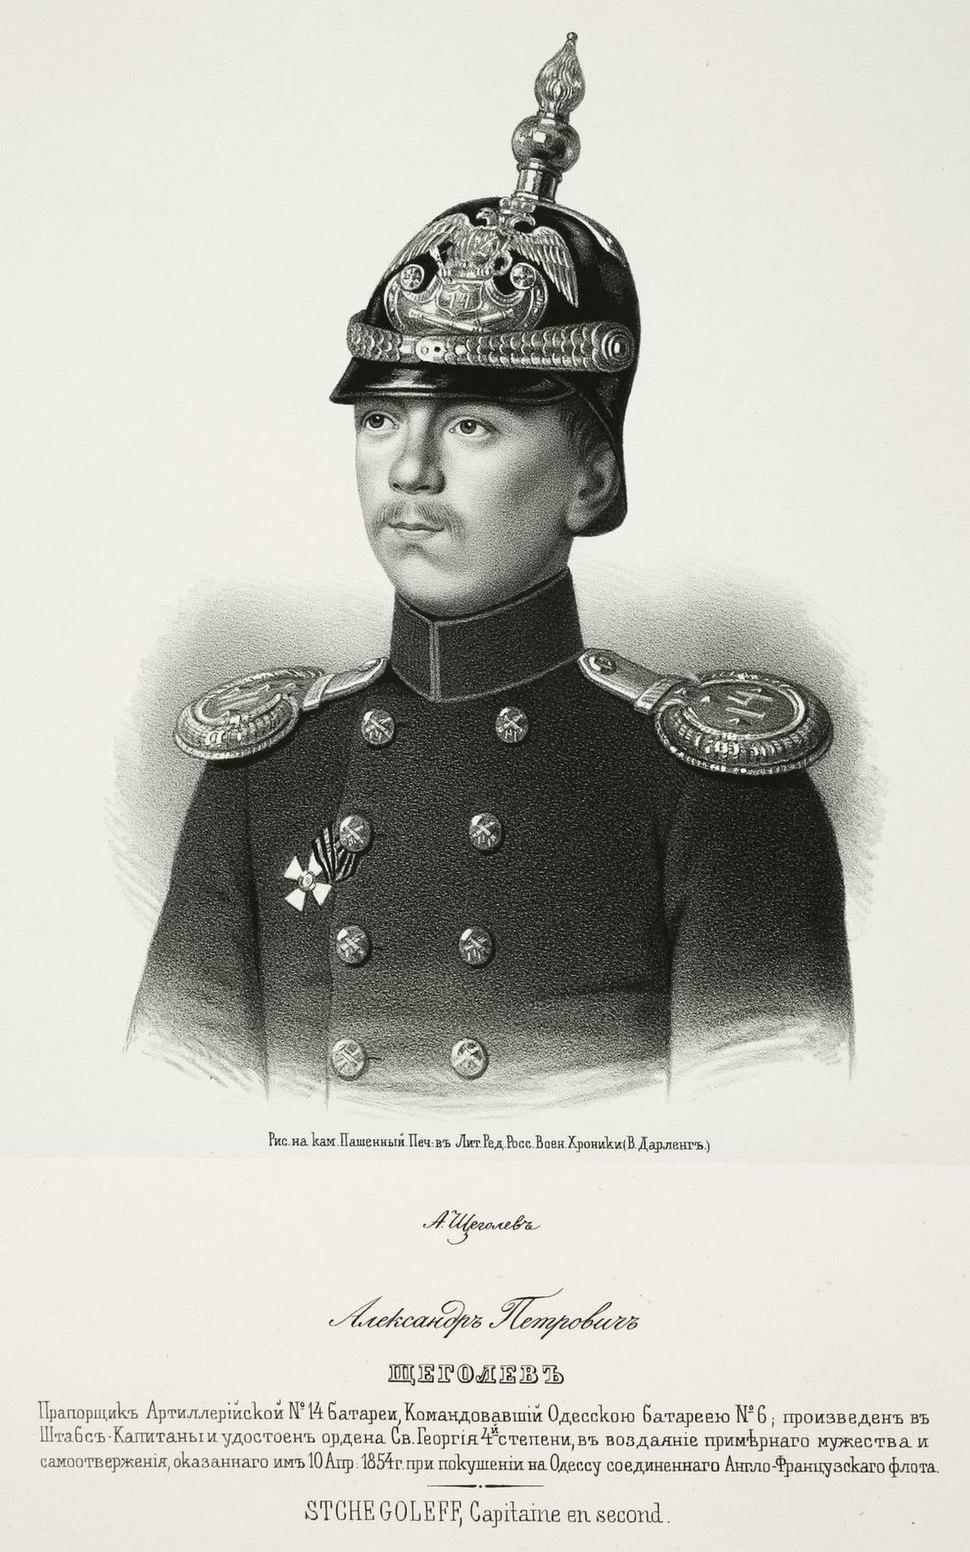 Shchegolev Alexandr Petrovitch.jpeg